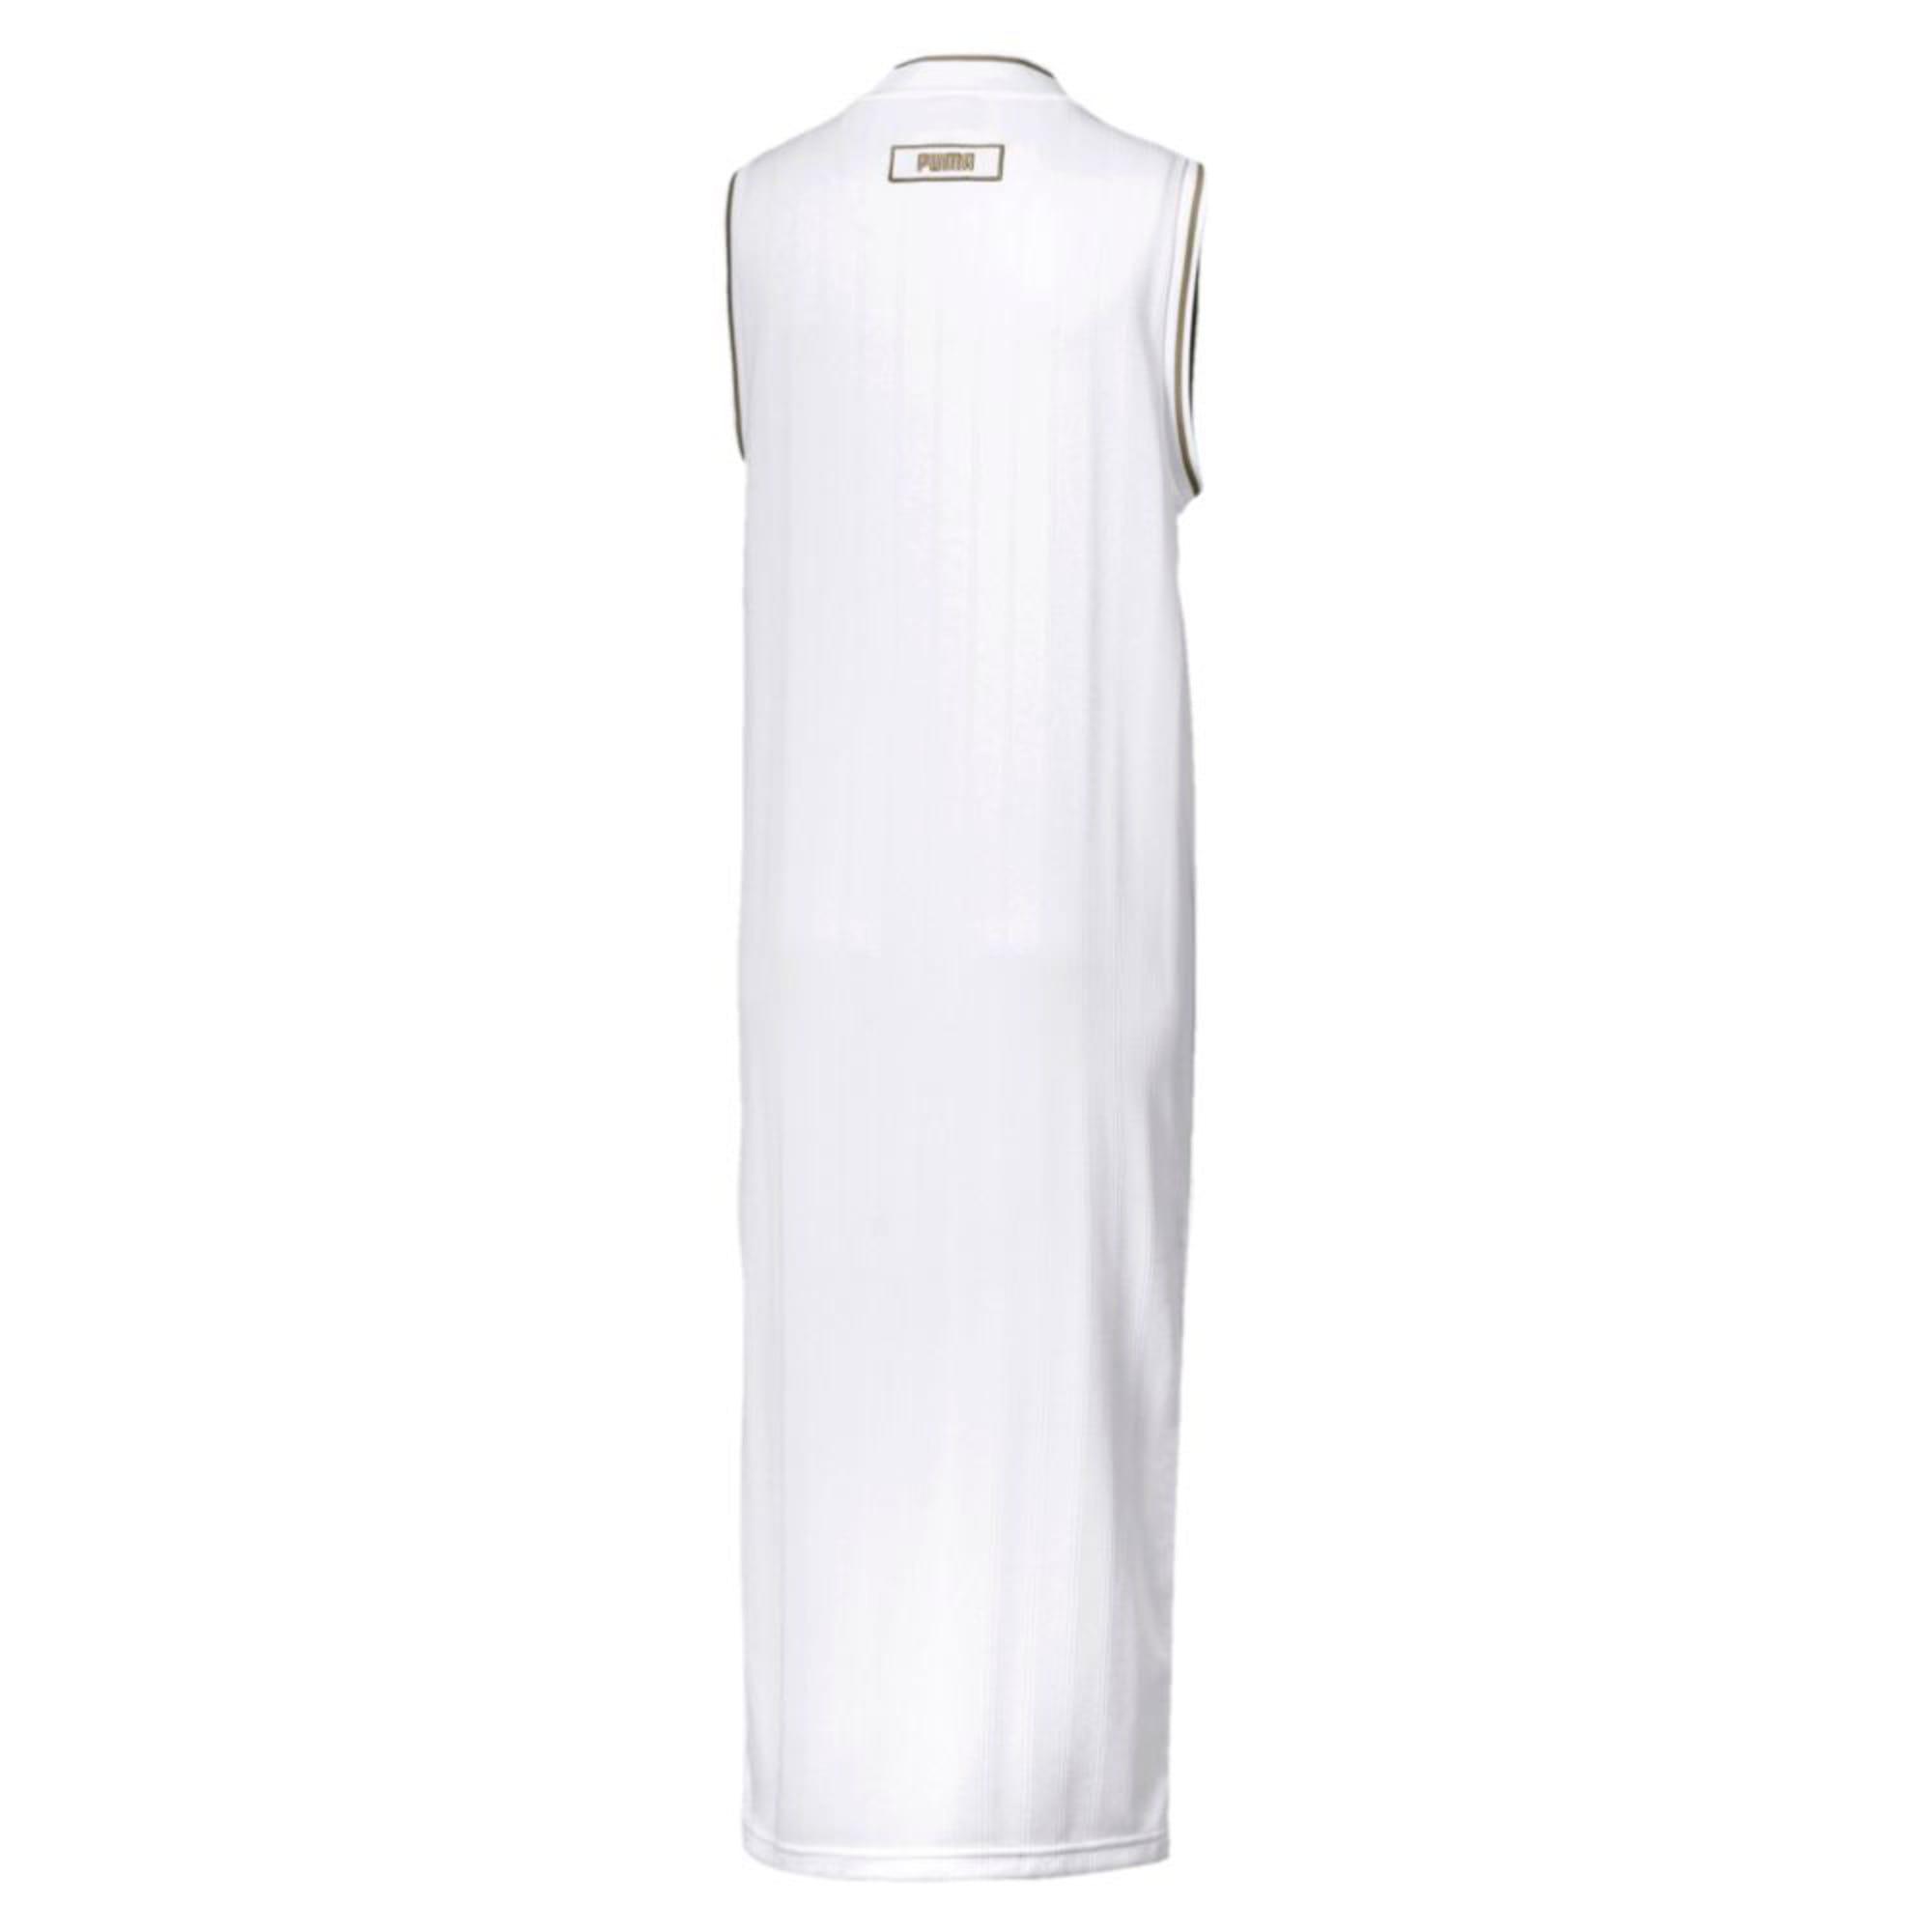 Thumbnail 2 of Retro Women's Dress, Puma White, medium-IND